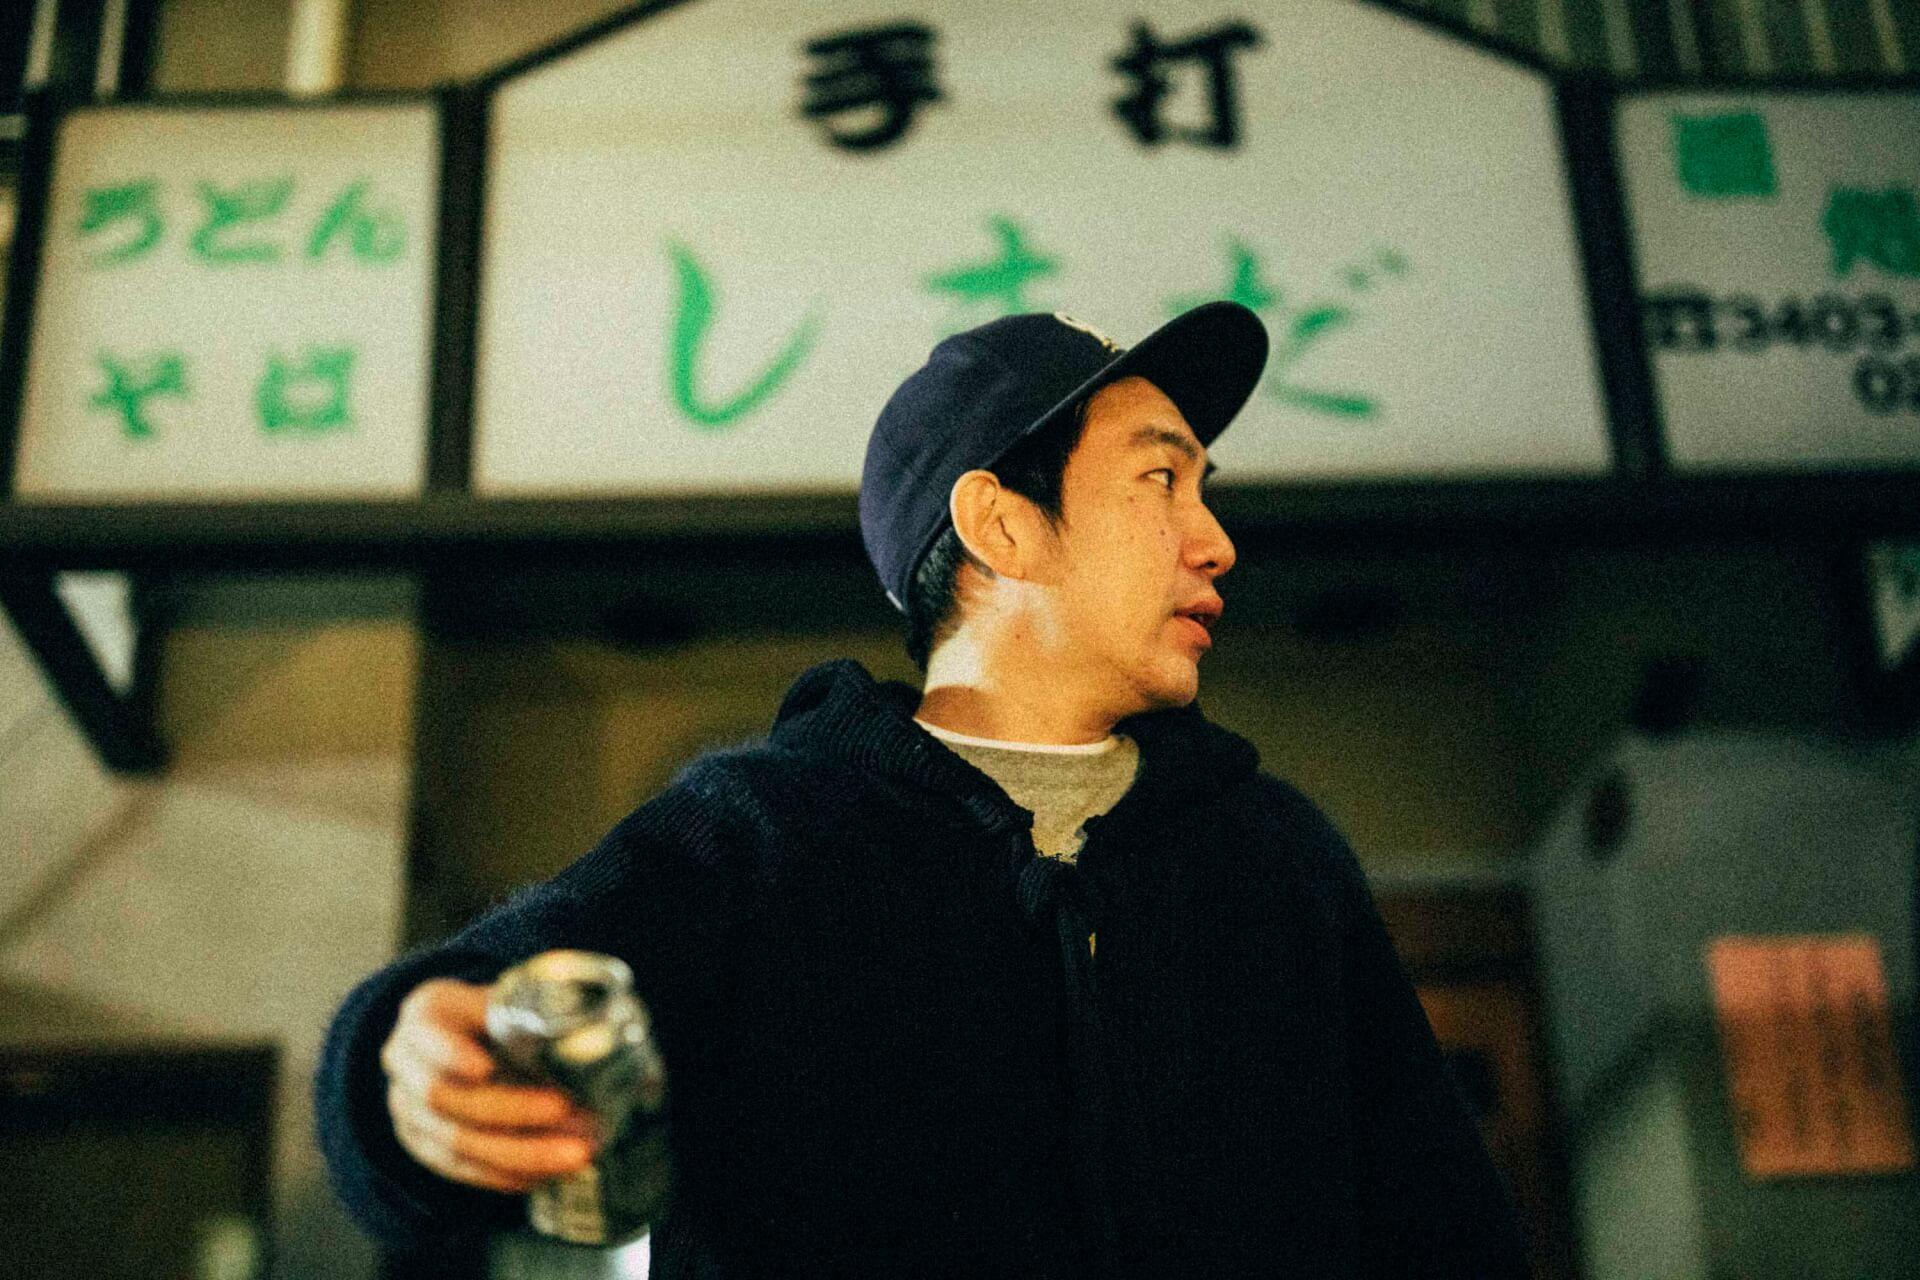 "So I'm Your Friend ―― 原島""ど真ん中""宙芳、インタヴュー interview1903-harashima-michiyoshi-2"